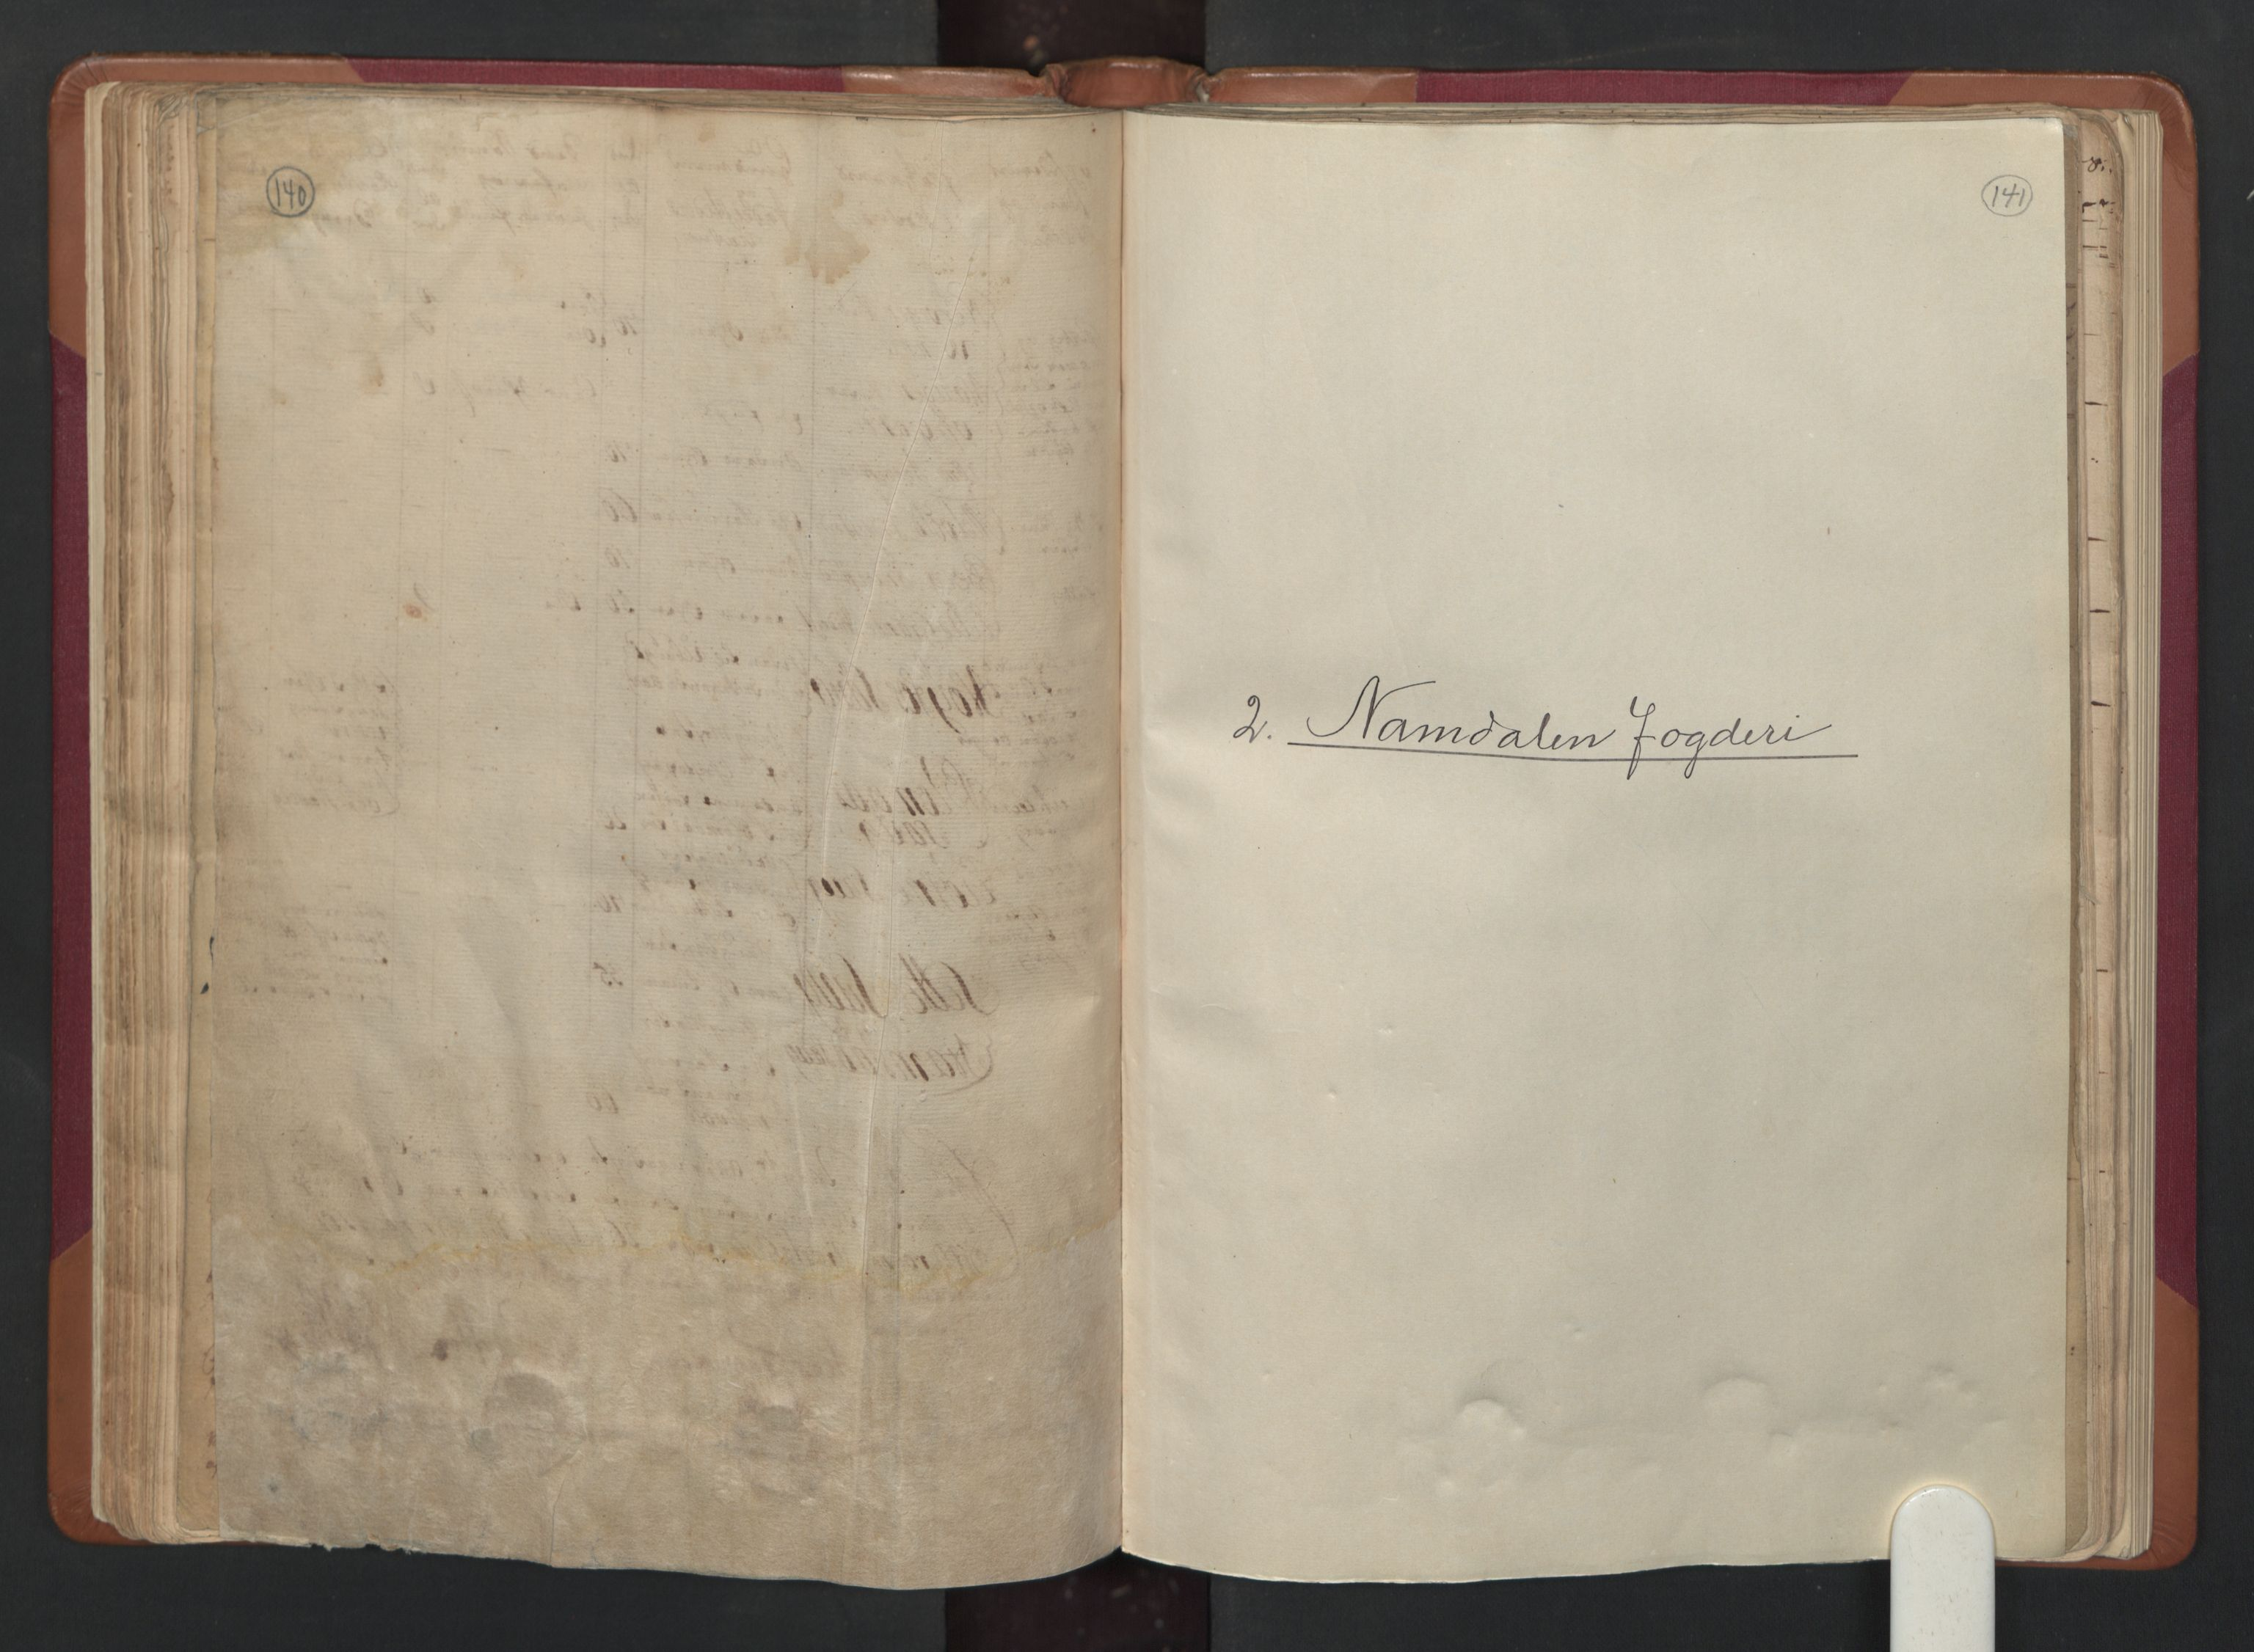 RA, Manntallet 1701, nr. 15: Inderøy fogderi og Namdal fogderi, 1701, s. 140-141